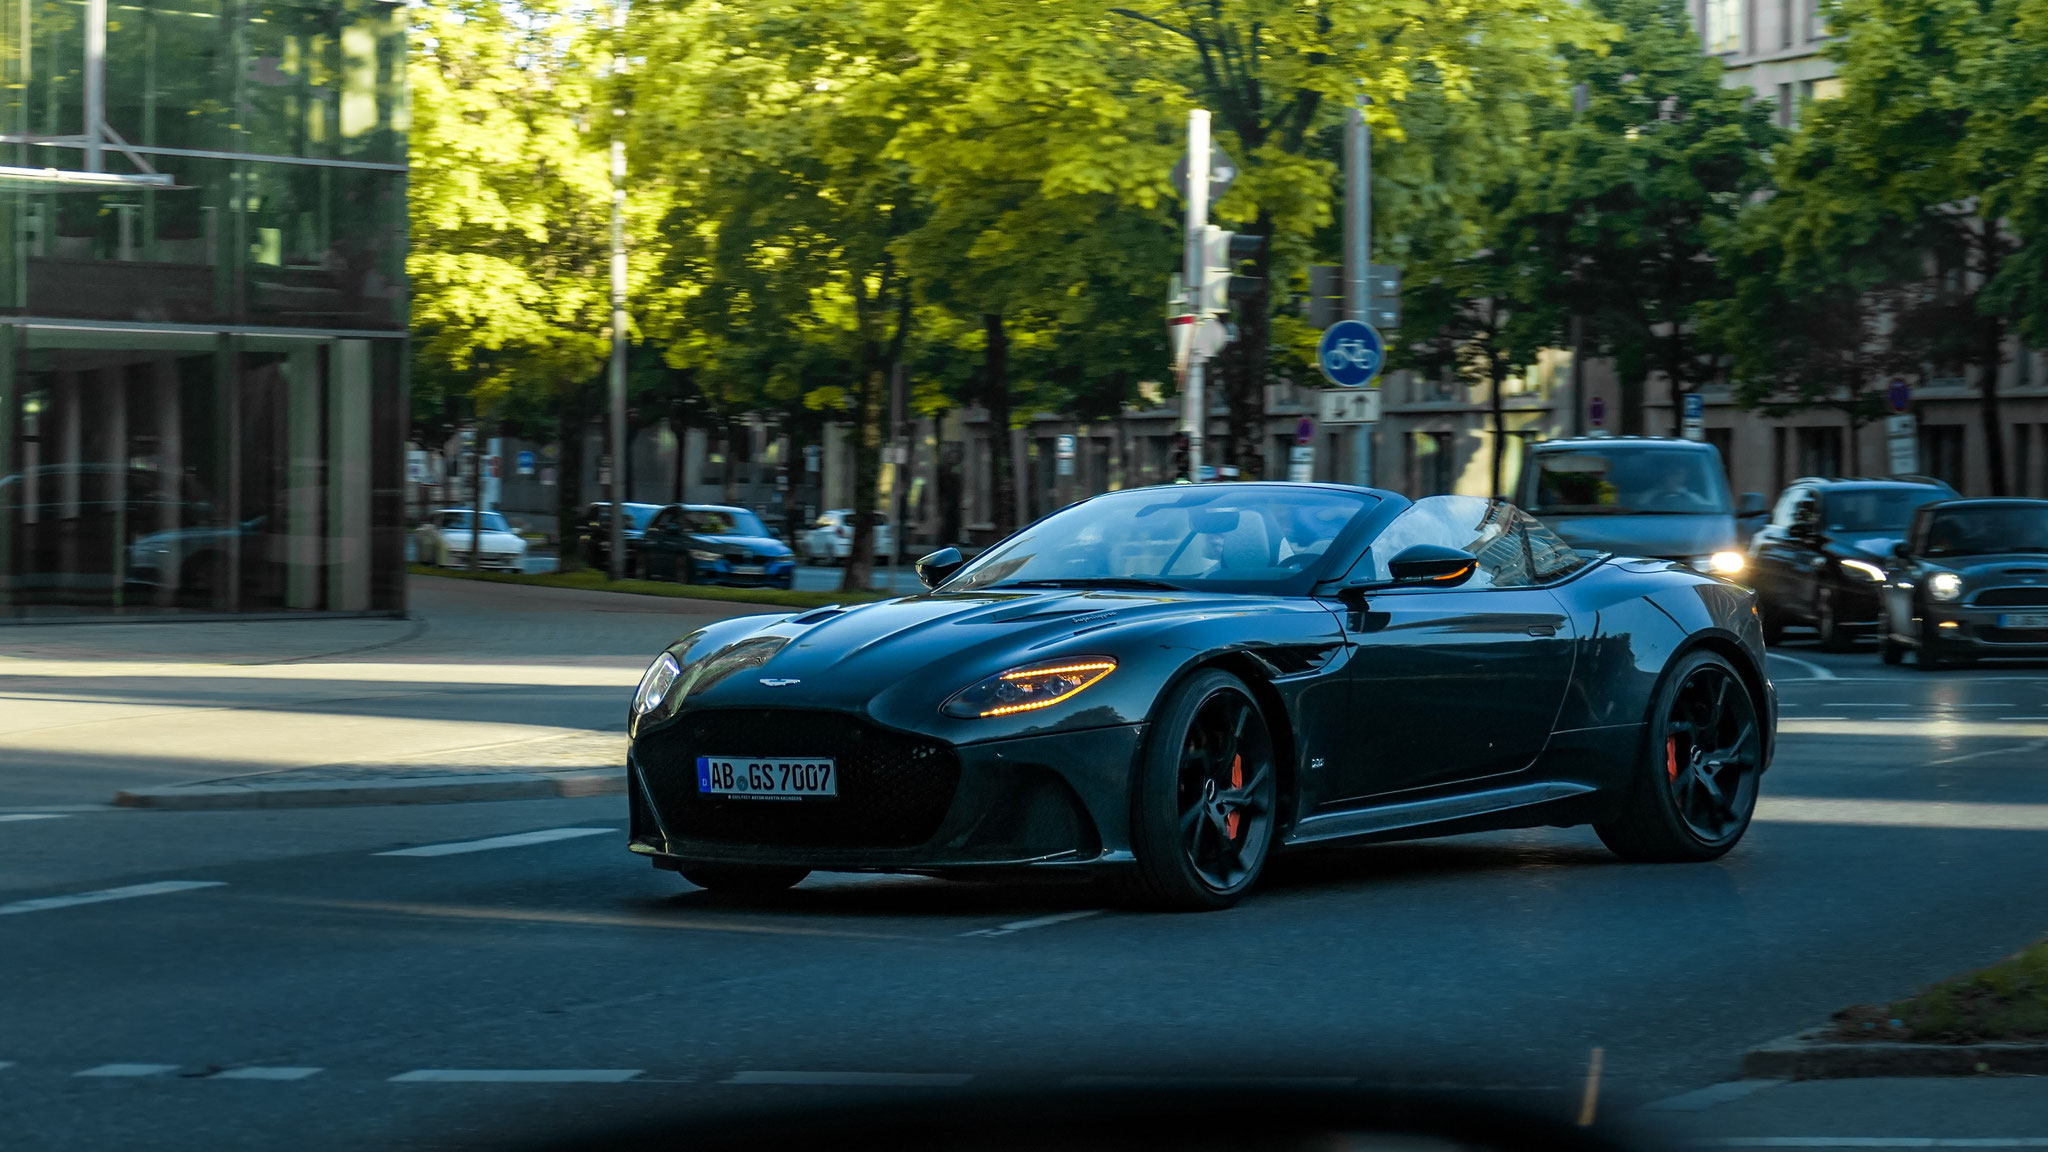 Aston Martin DBS Superleggera Volante - AB-GS-7007